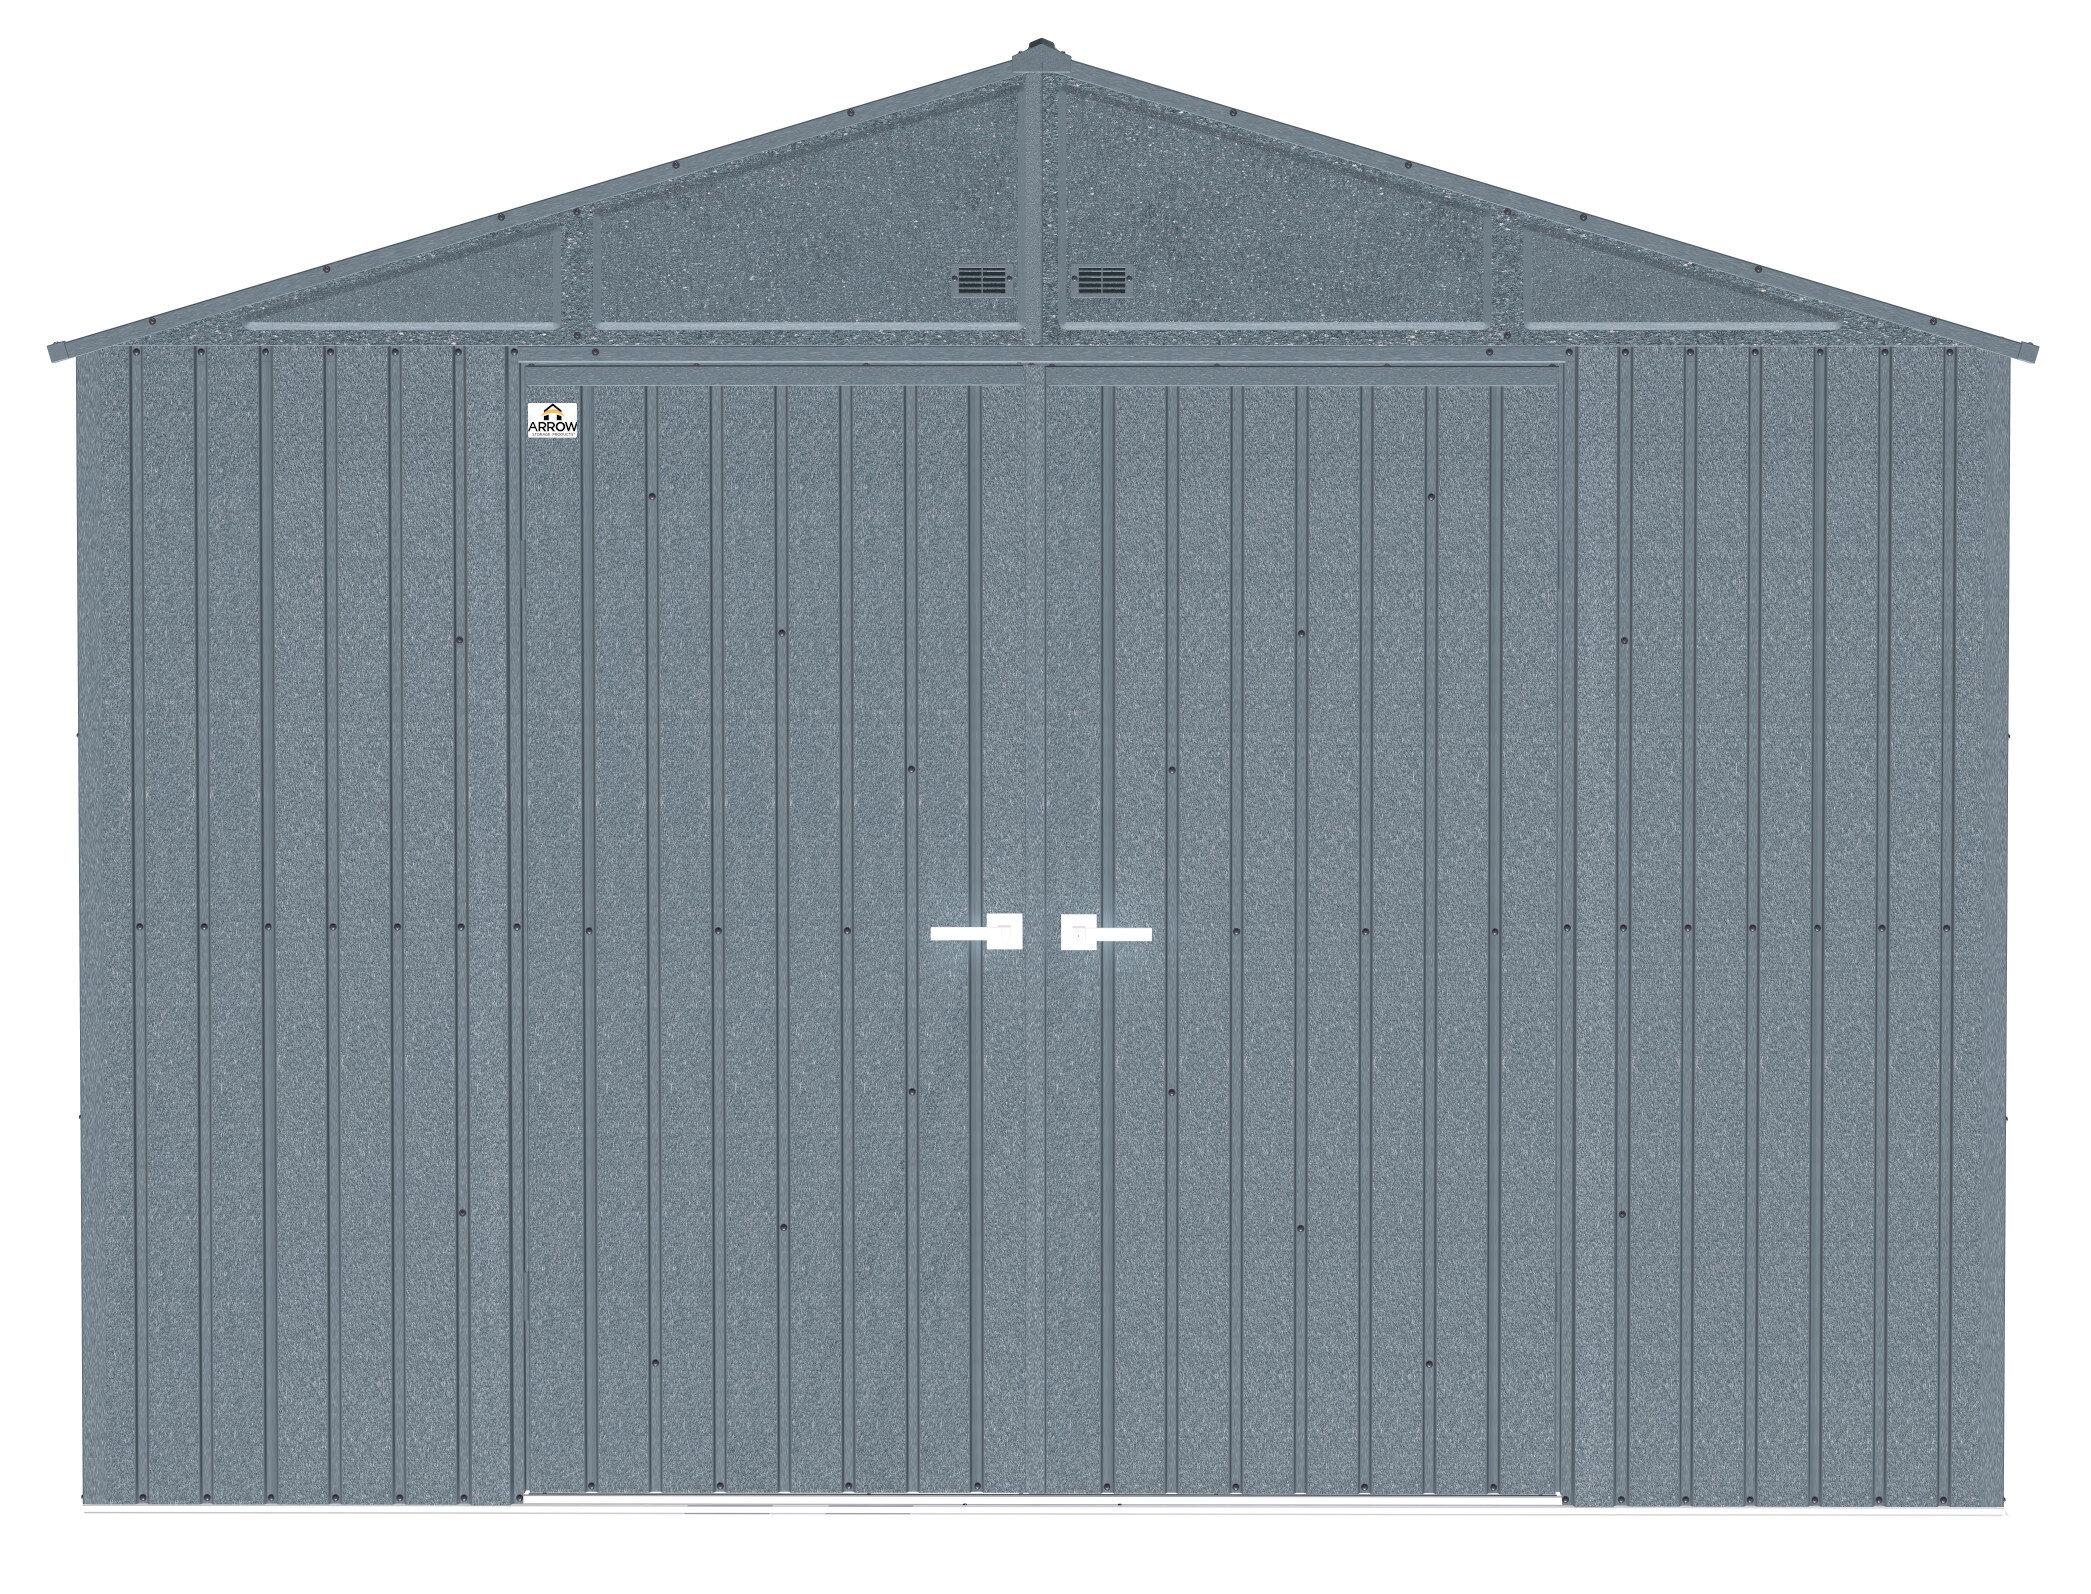 Arrow Elite 10 Ft W X 8 Ft D Metal Vertical Storage Shed Wayfair